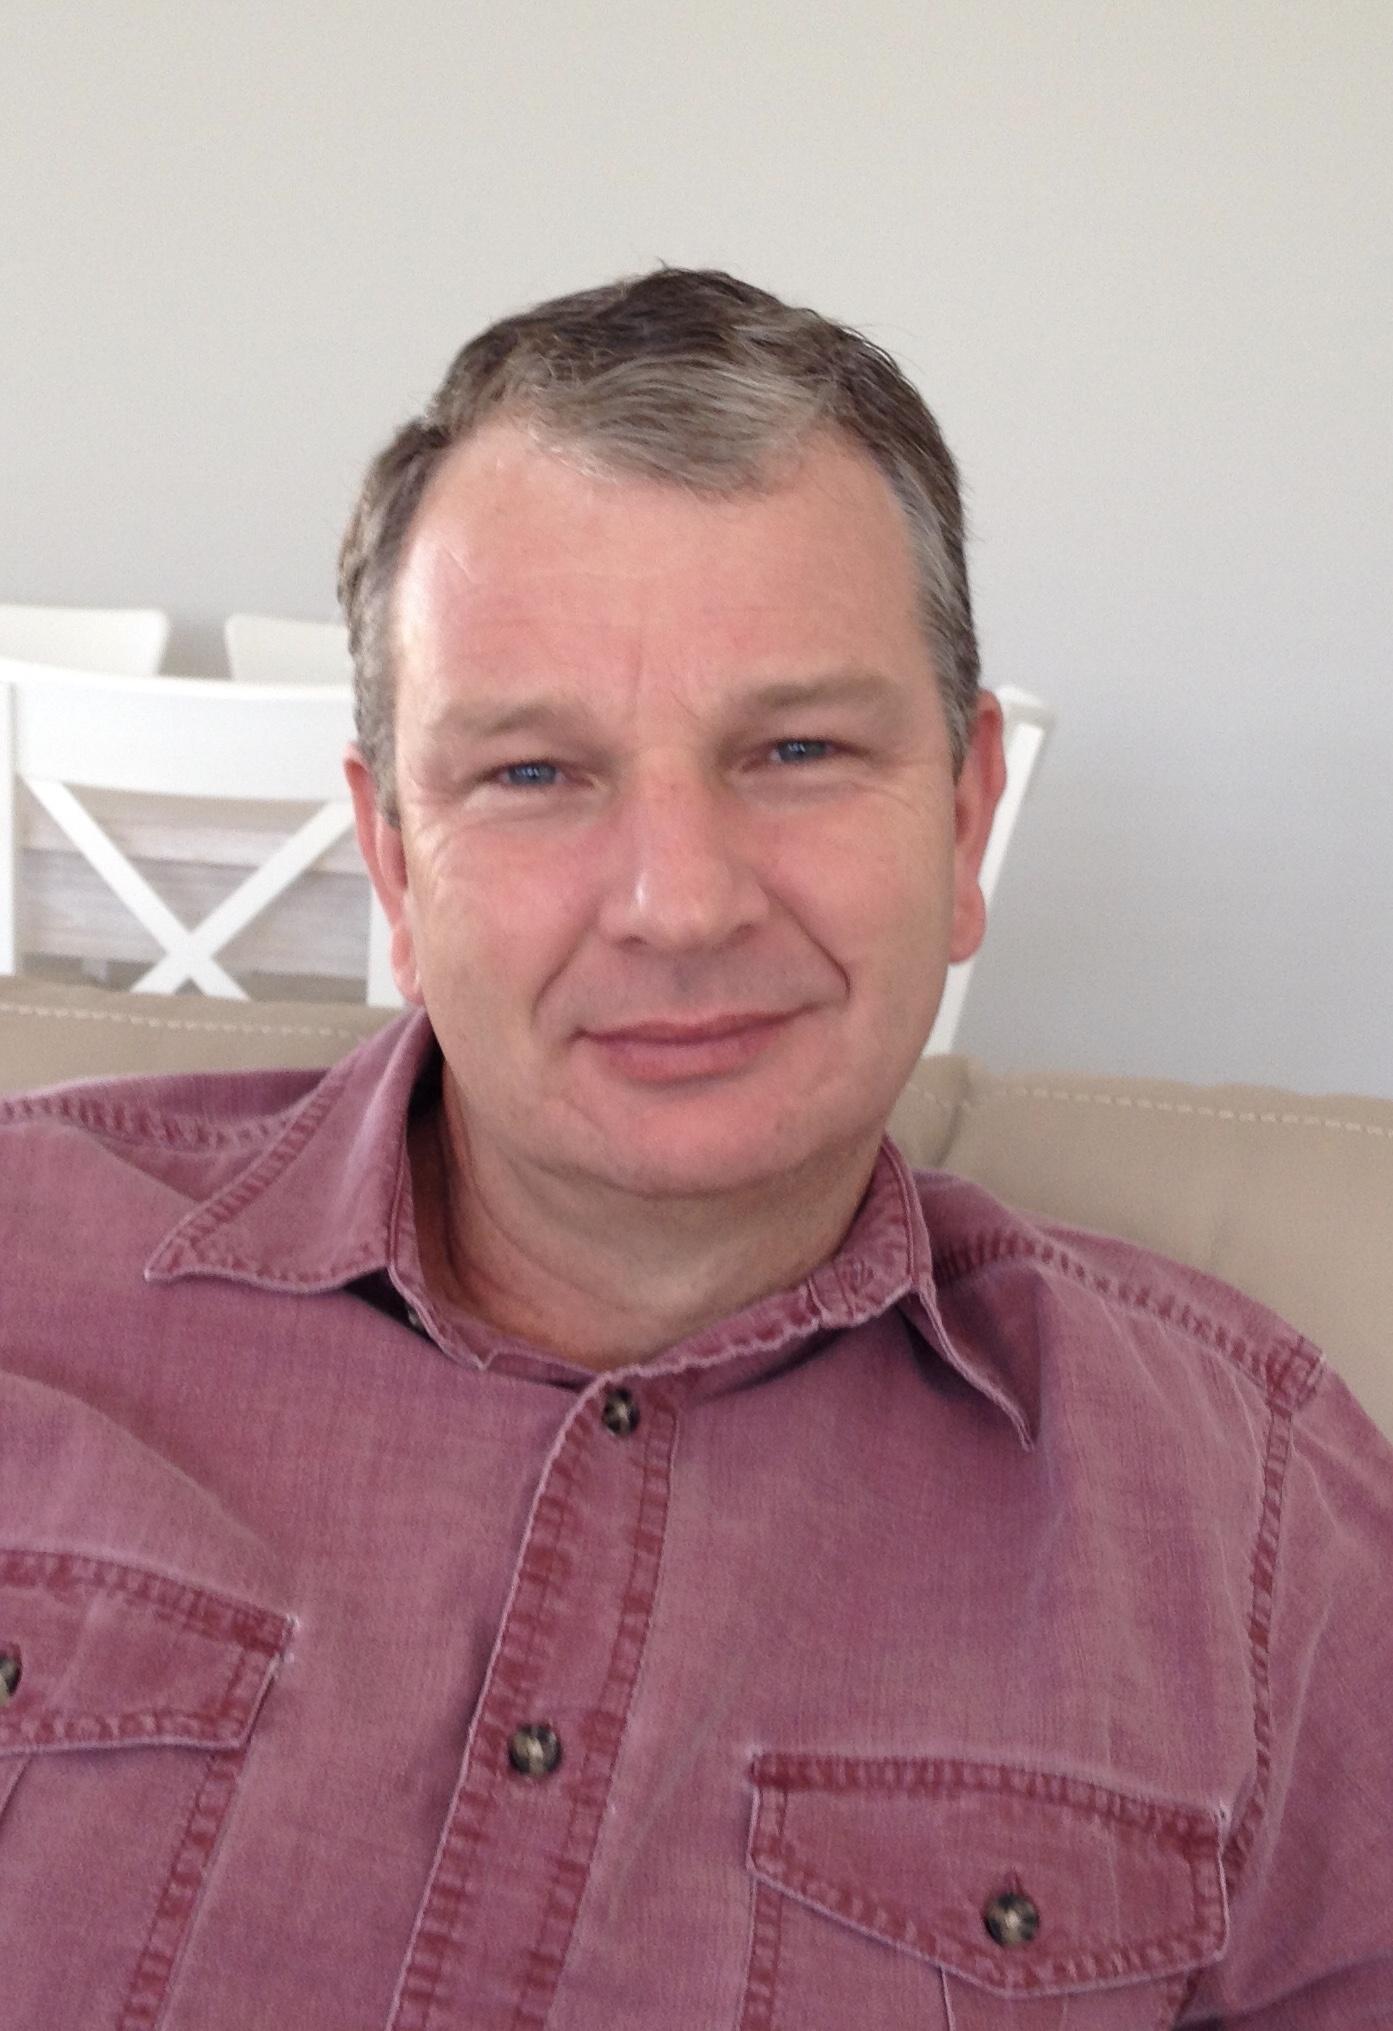 Richard Muhl